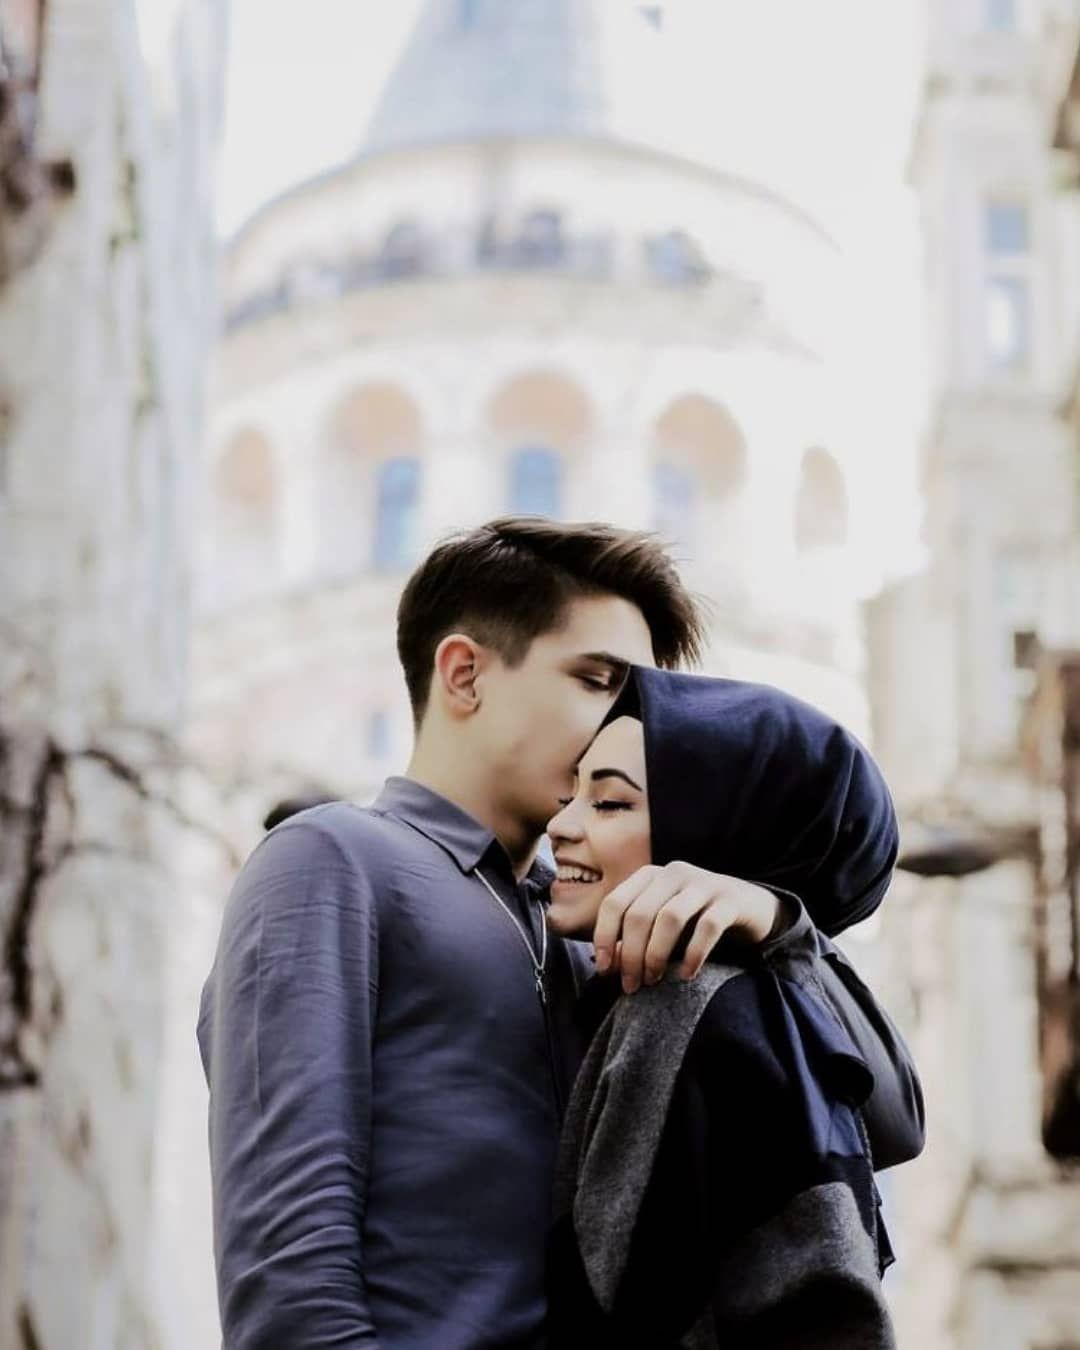 Dating musulman liber